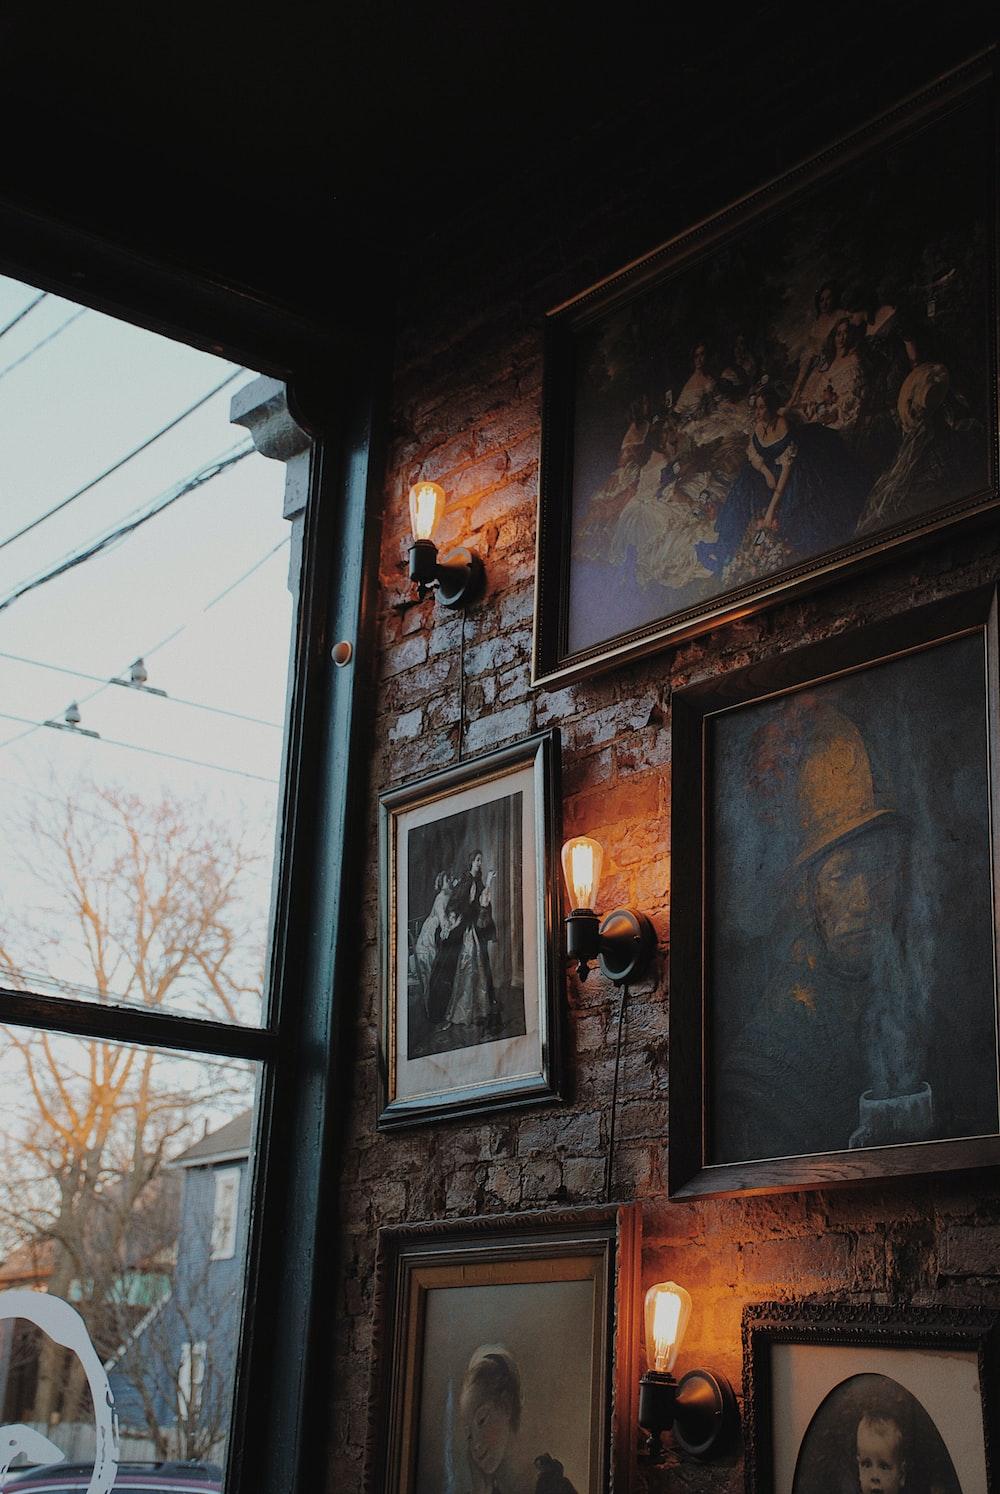 paintings on wall near window